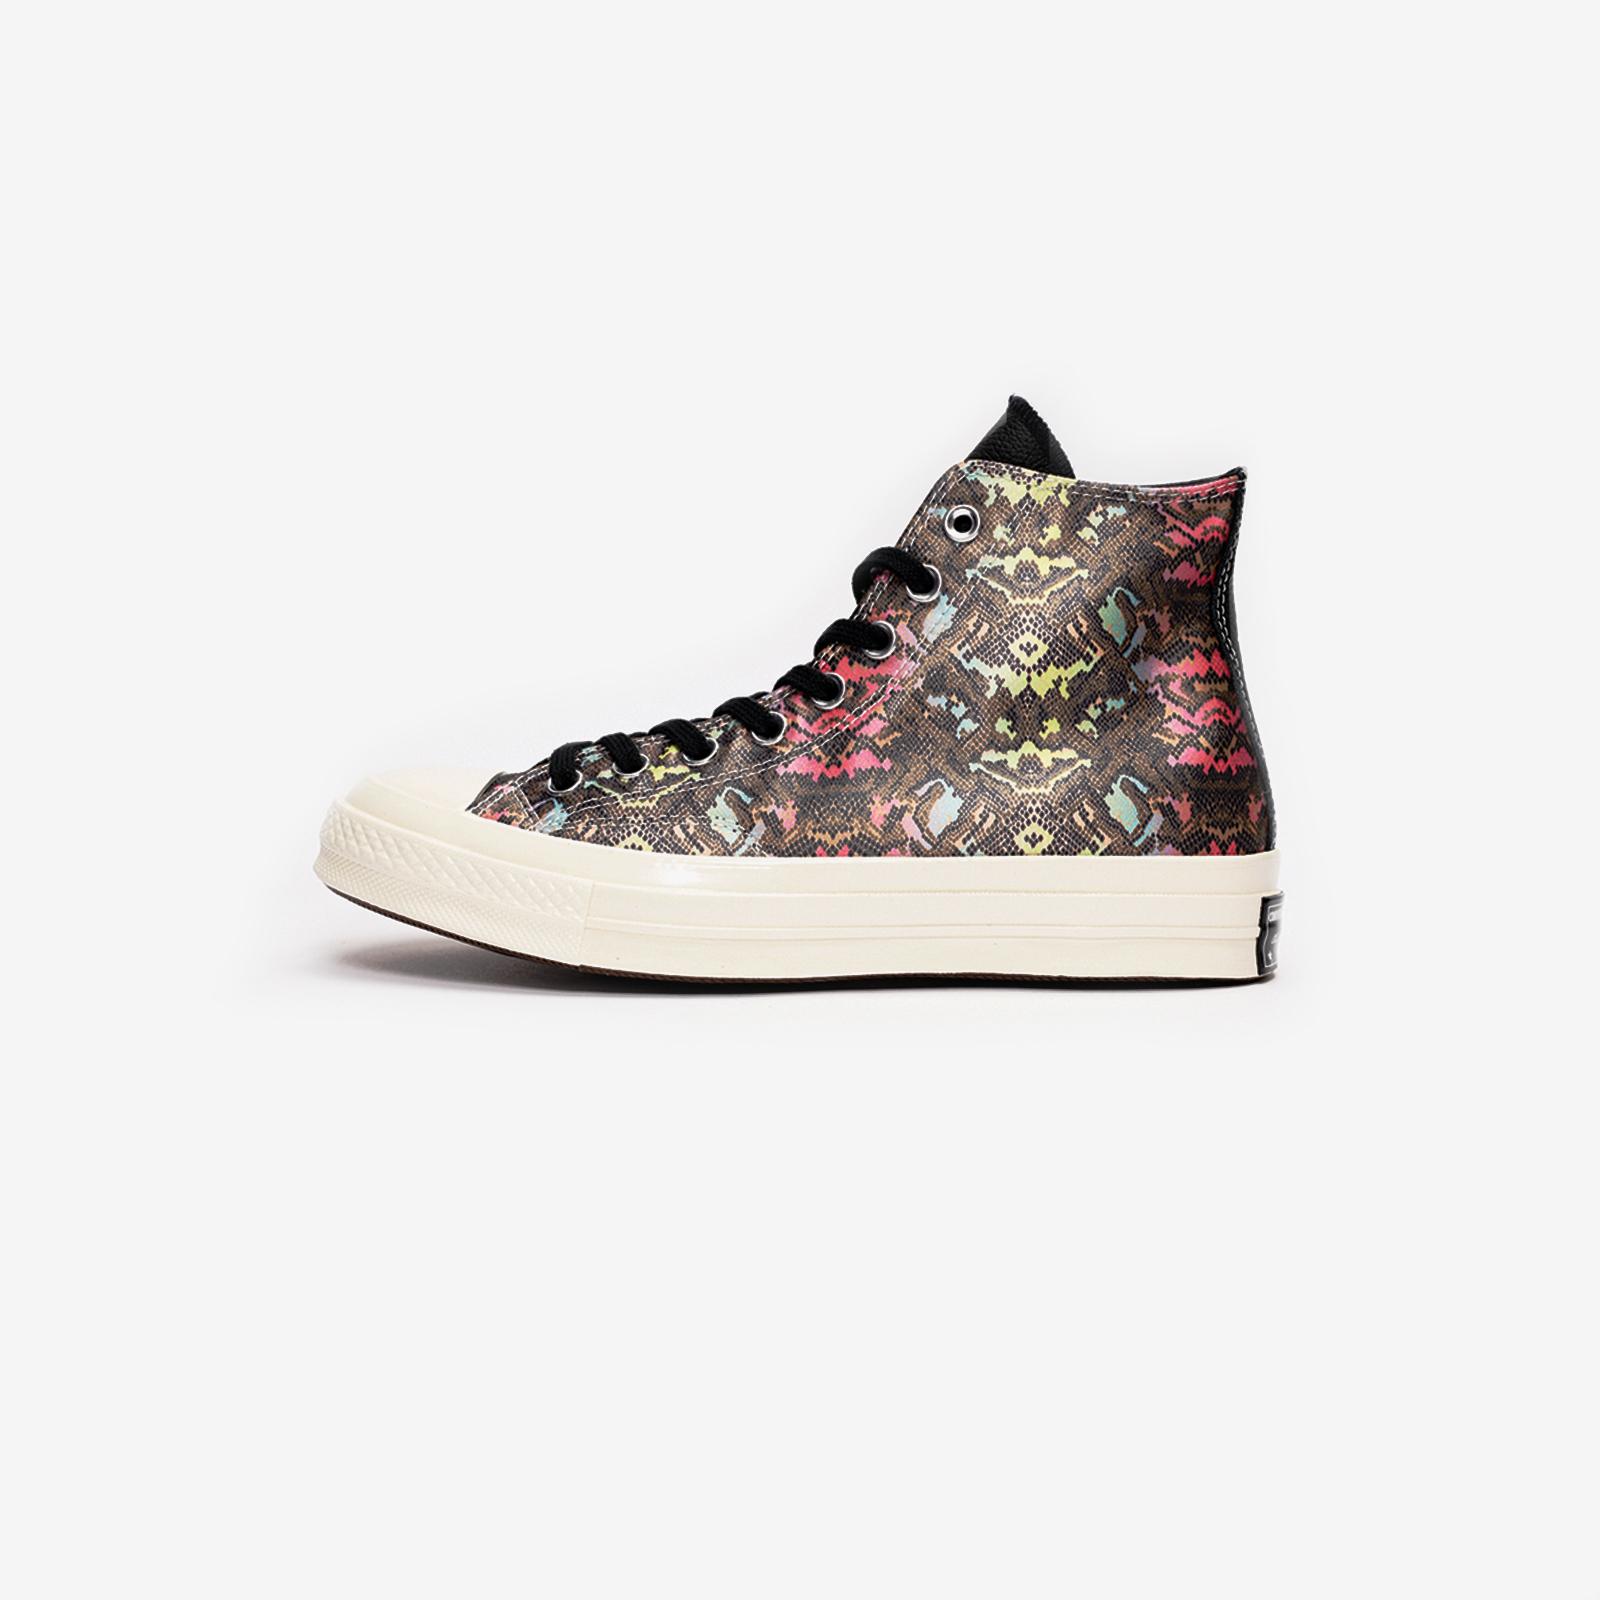 Converse Chuck 70 Satin Snake Print - 570264c - SNS | sneakers ...